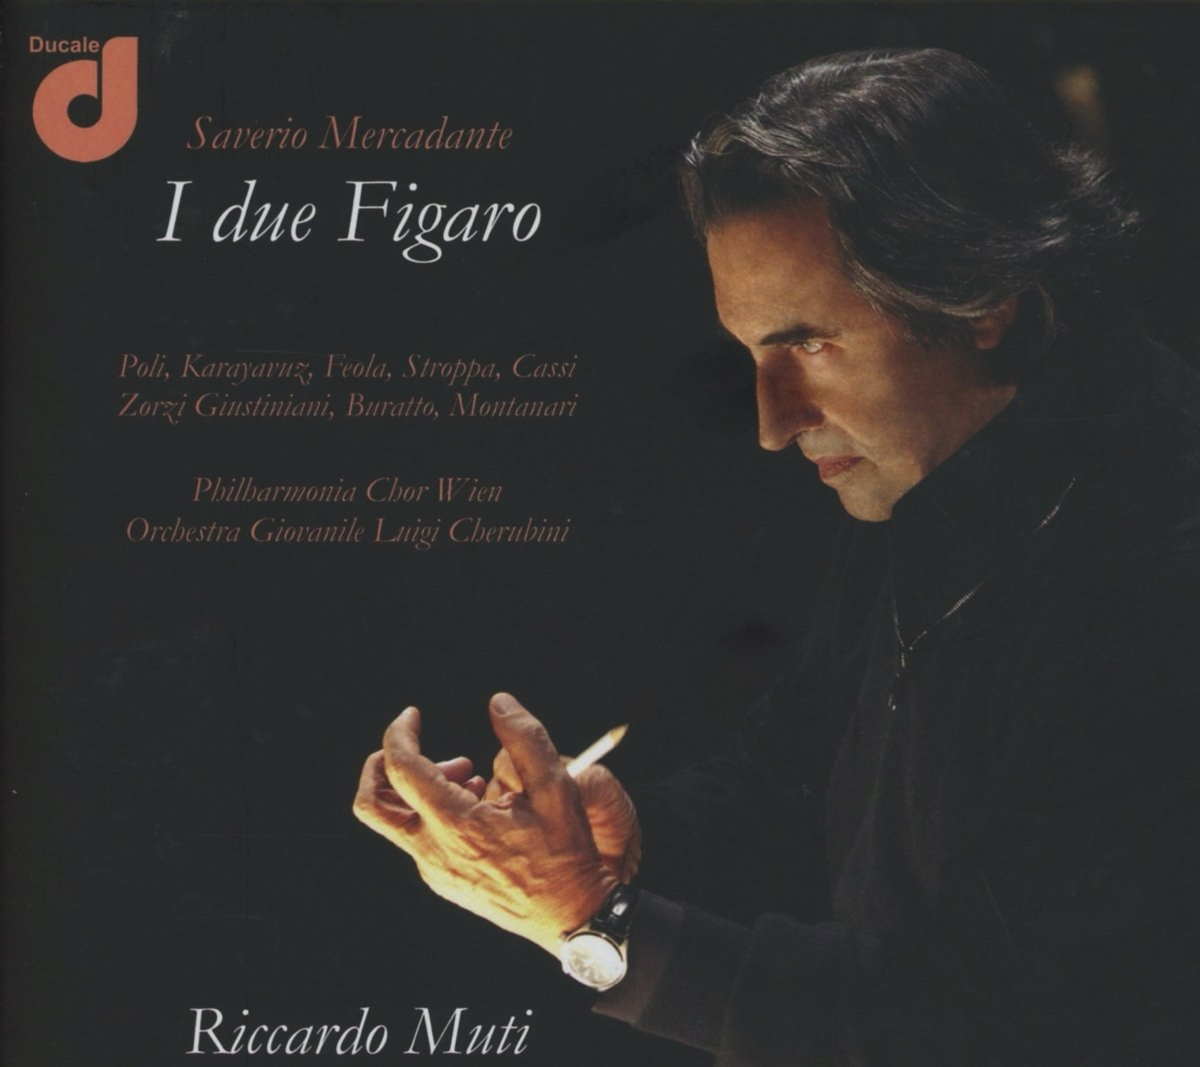 CD-Besprechung, Saverio Mercadante, I due Figaro, Riccardo Muti Music  klassik-begeistert.de